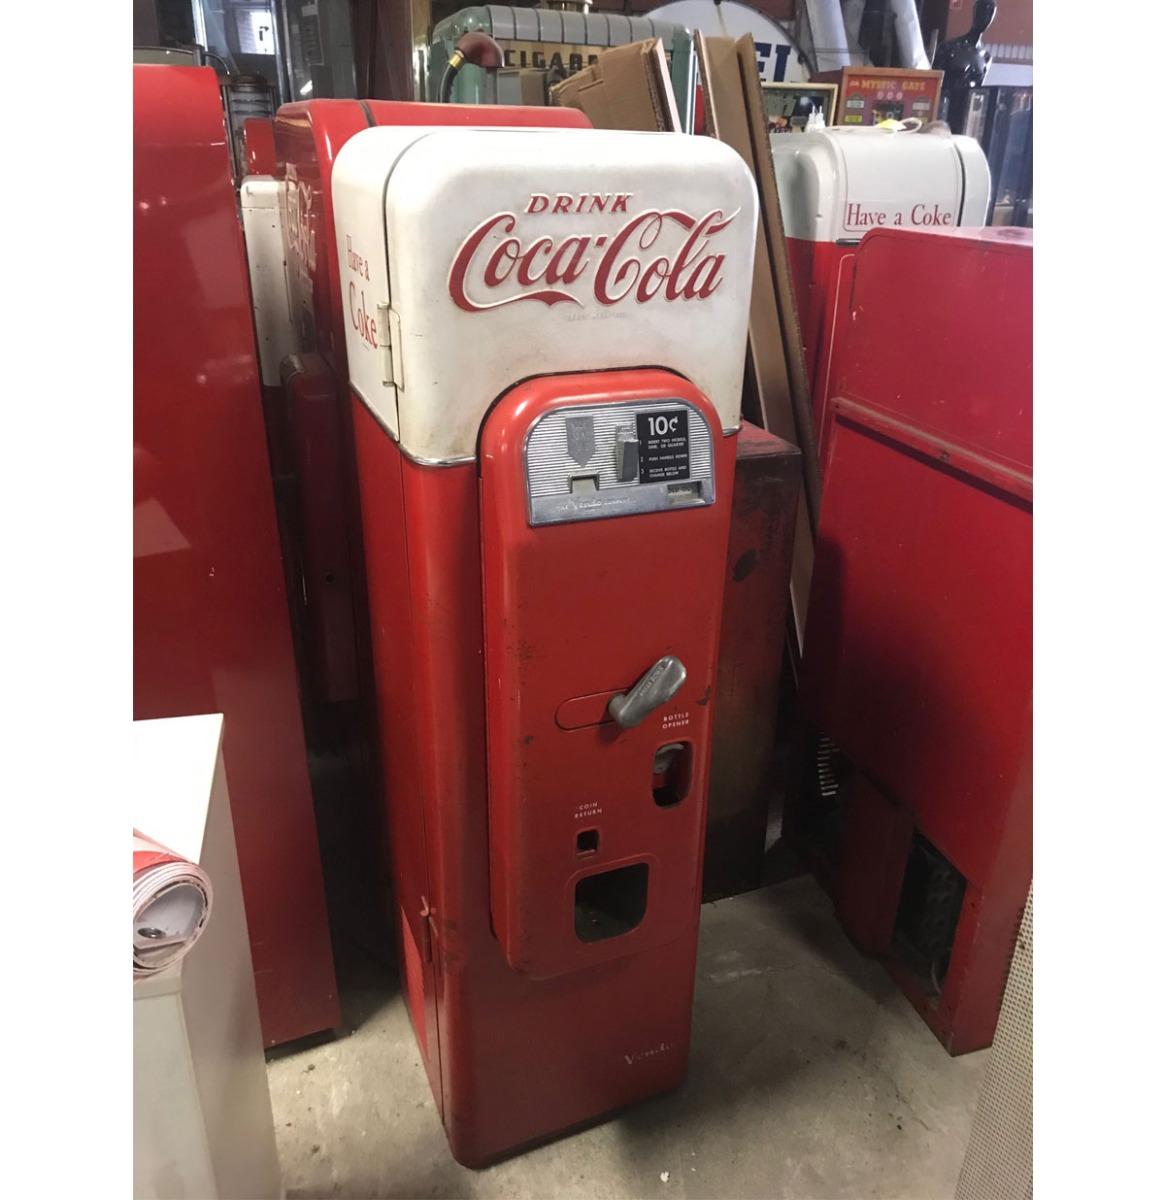 Coca-Cola Vendo 44 Automaat - Origineel